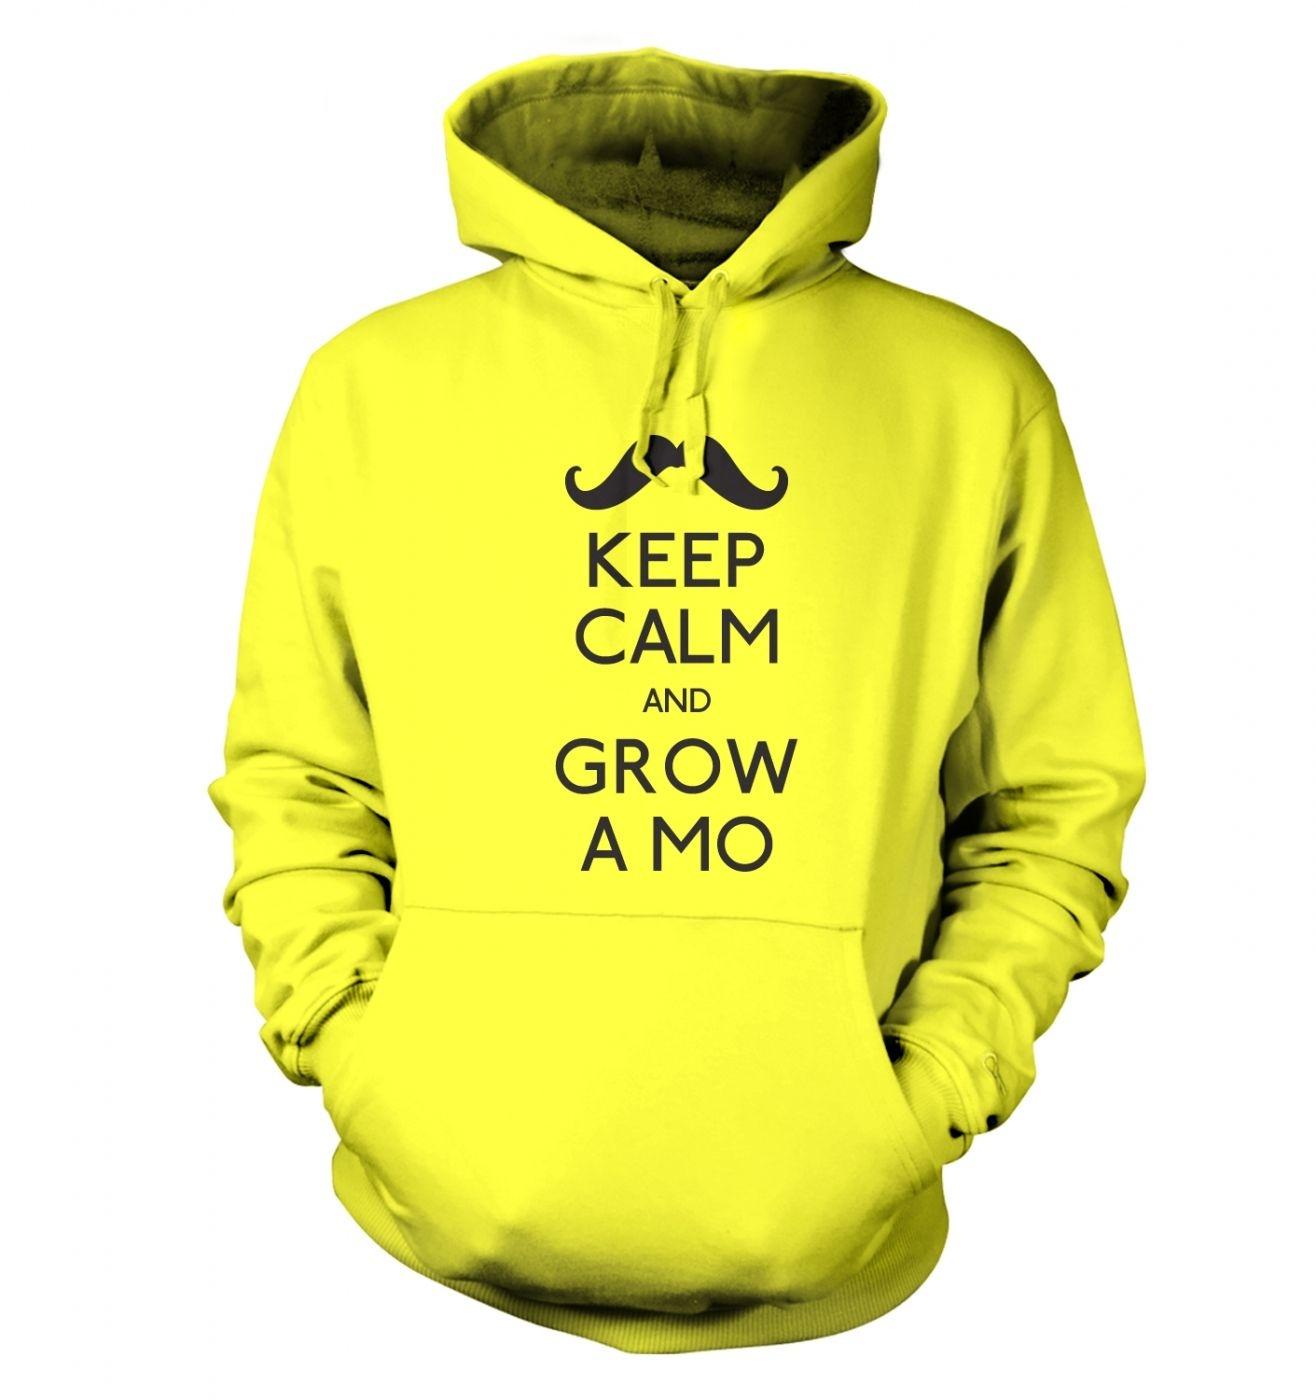 Keep Calm and Grow a Mo Adult Hoodie